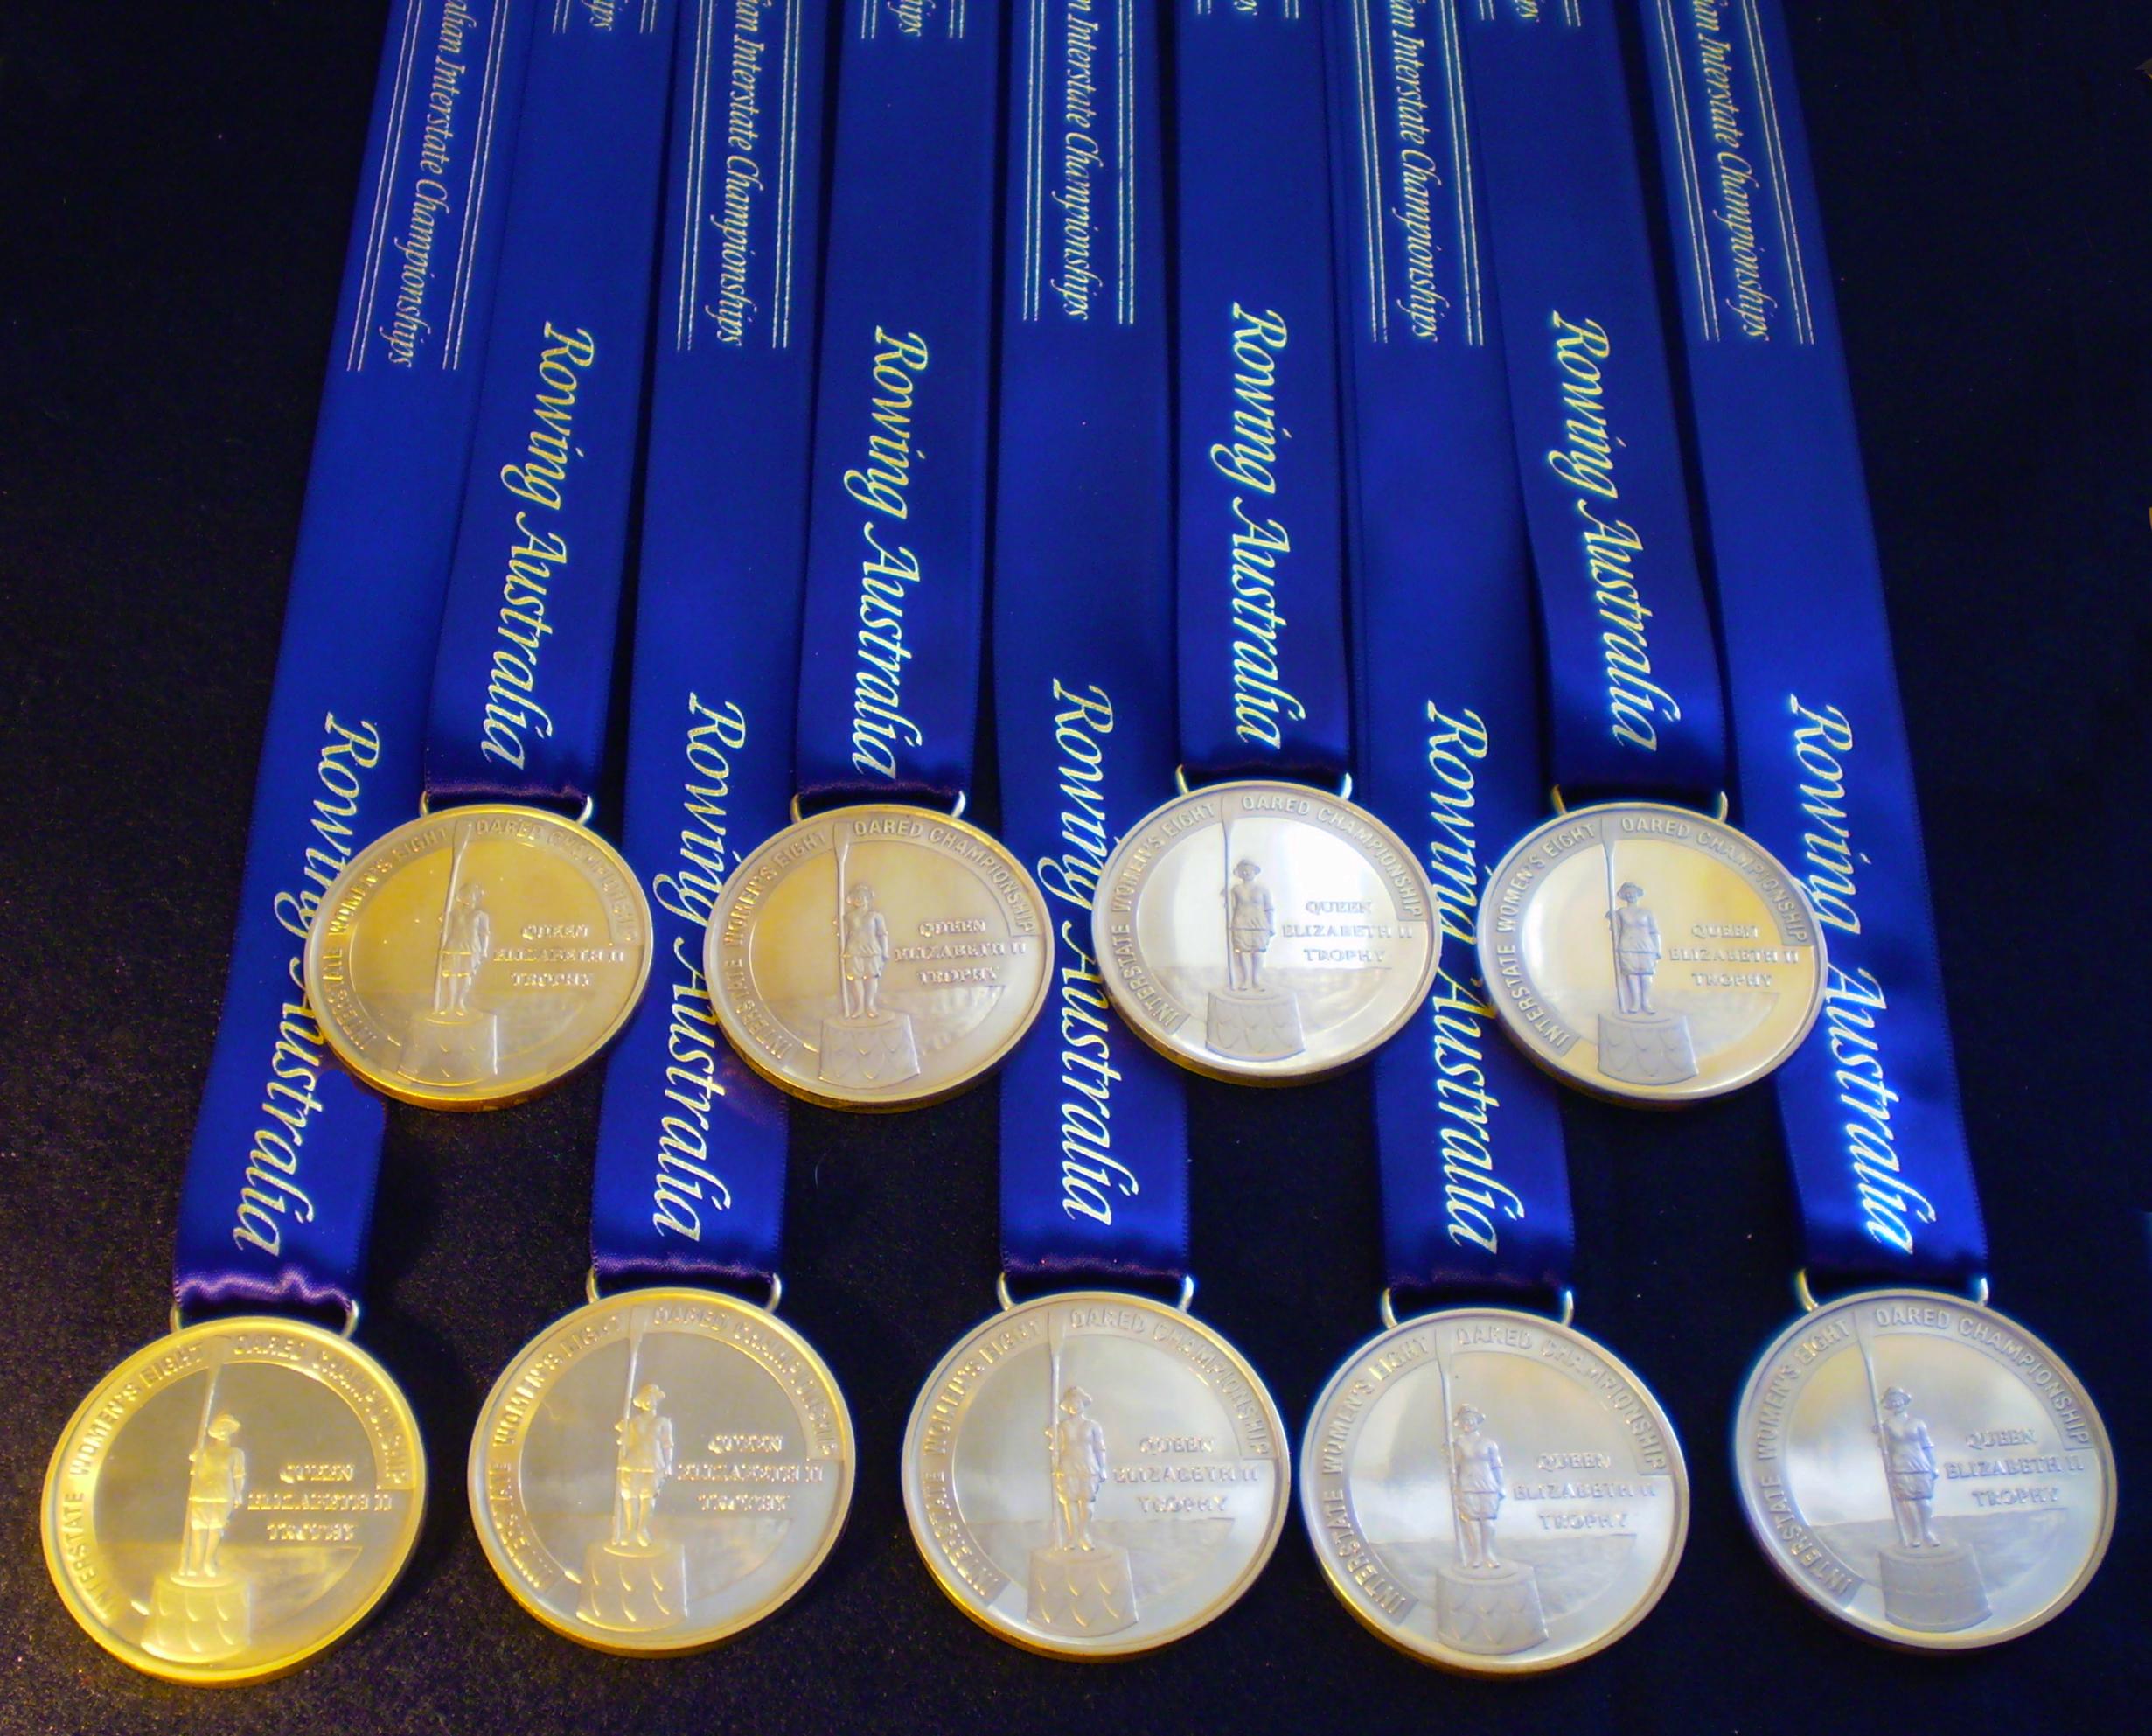 Rowing Australia medals